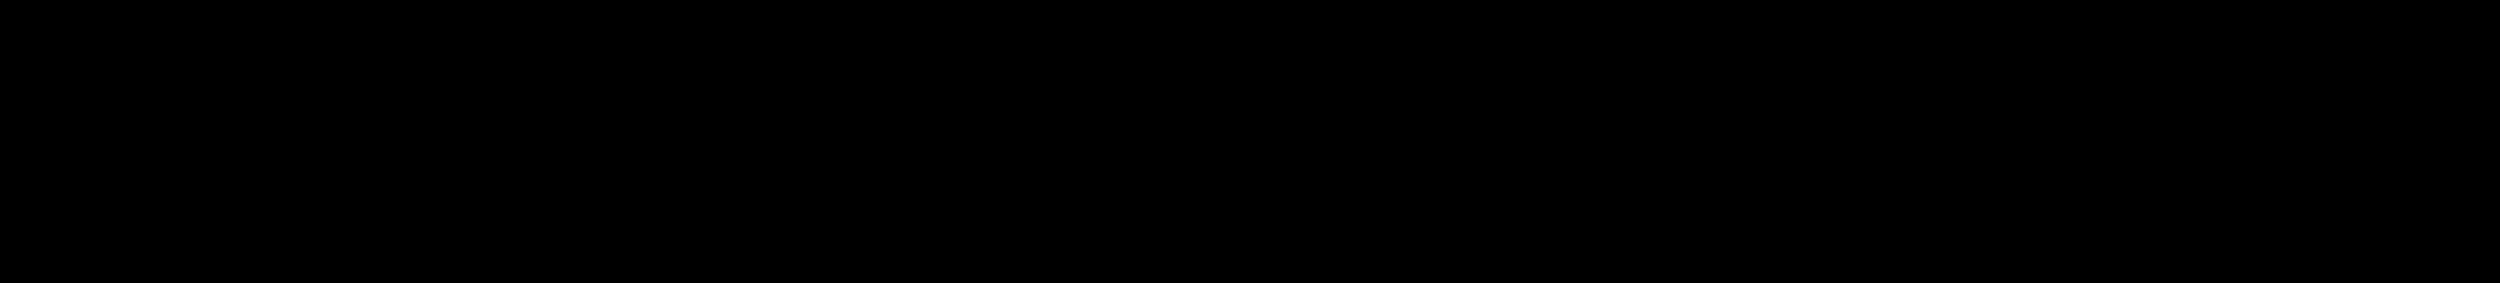 gifs-labelArtboard-7.png